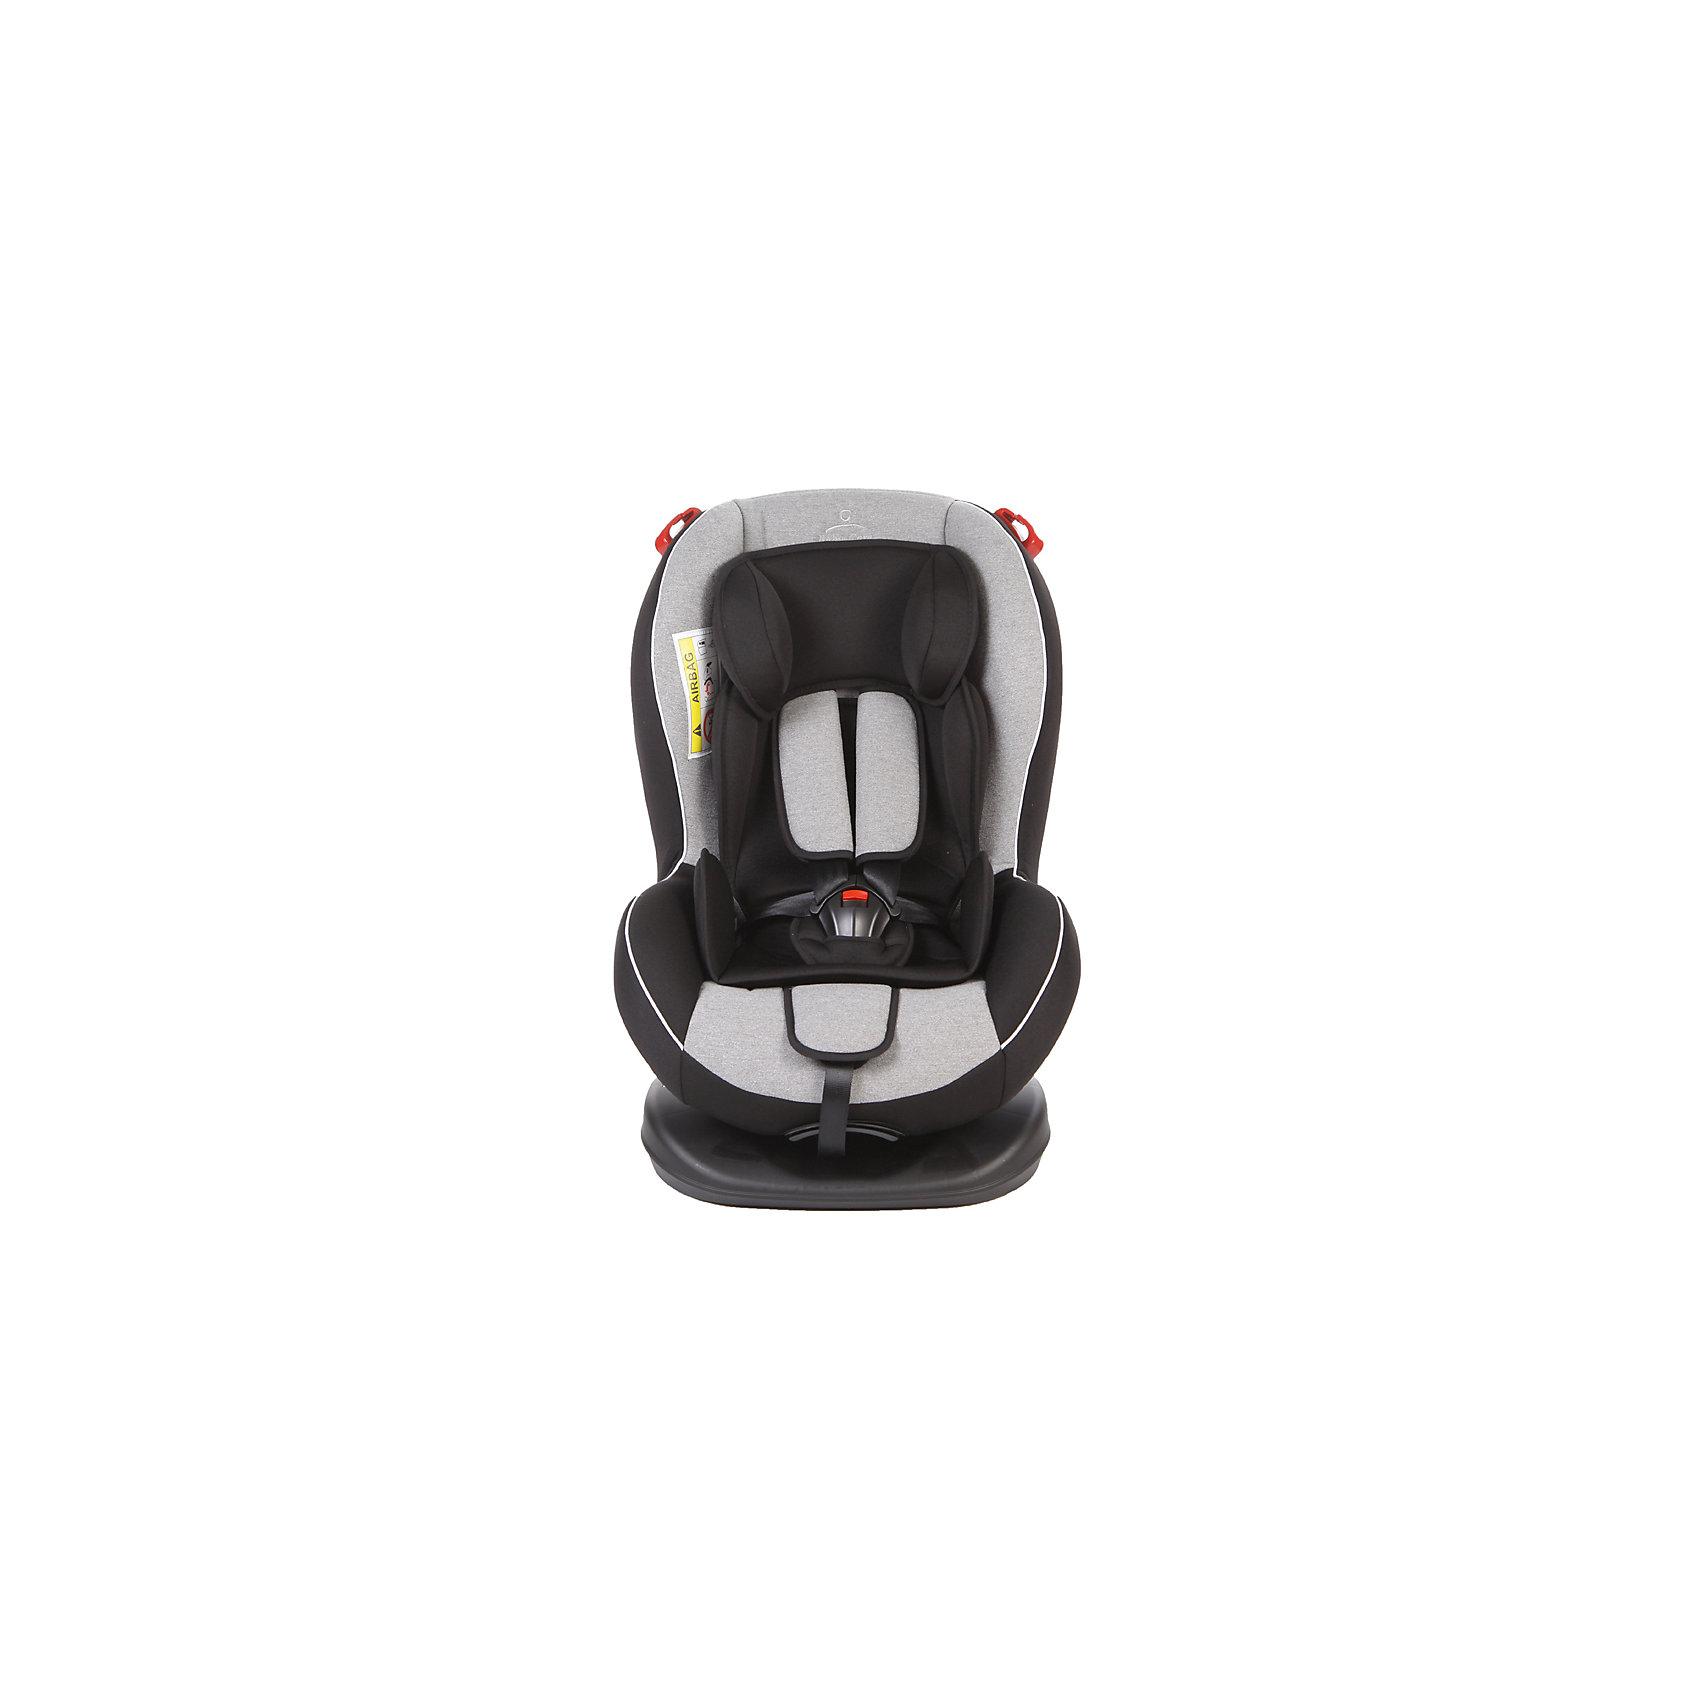 Автокресло Basic Evolution 0-25 кг, Baby Care, серый/чёрный